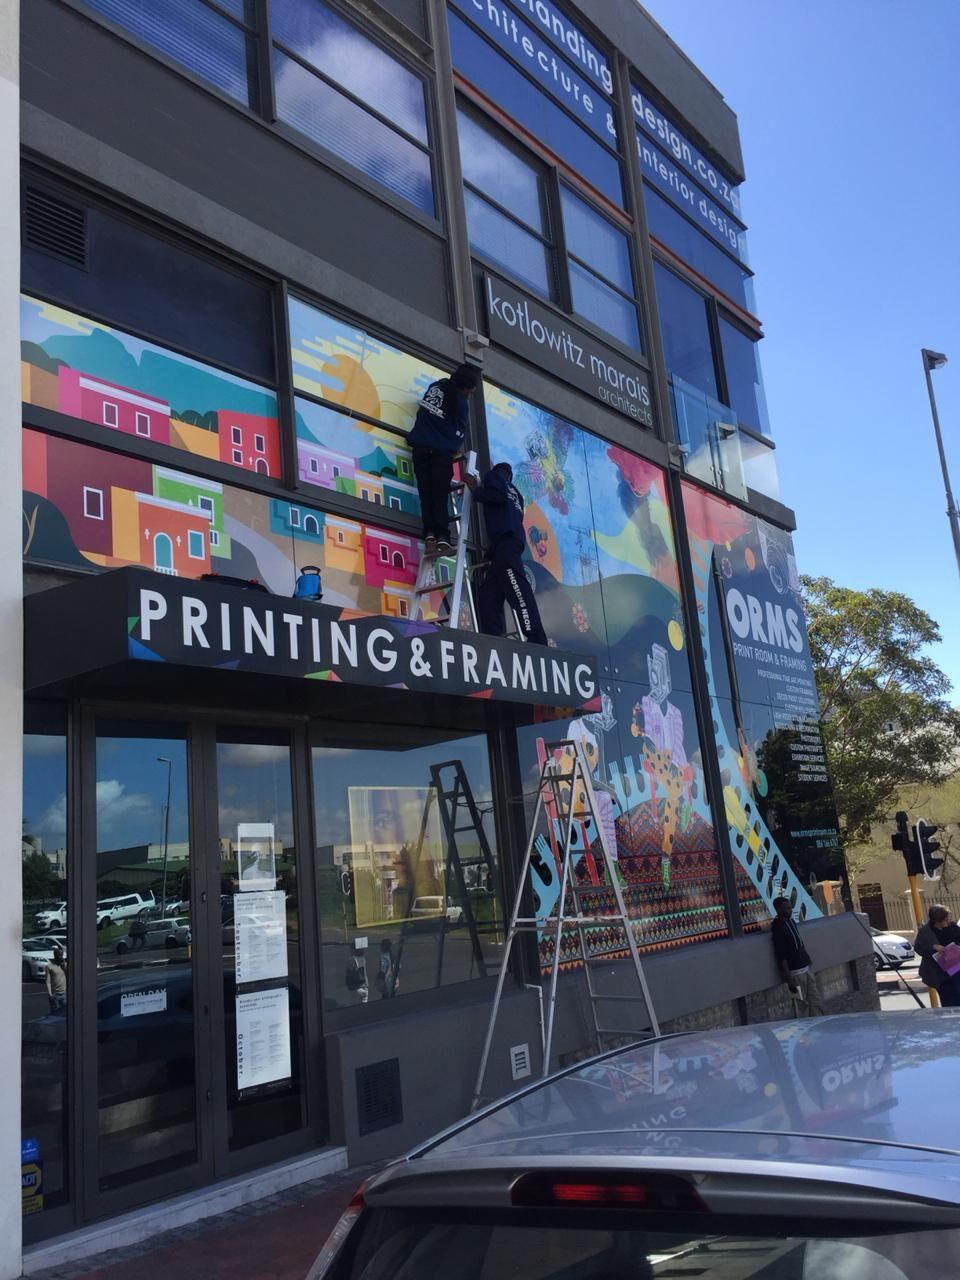 Orms Mural Illustration Window Vinyl & Van Artwork by Riette Error